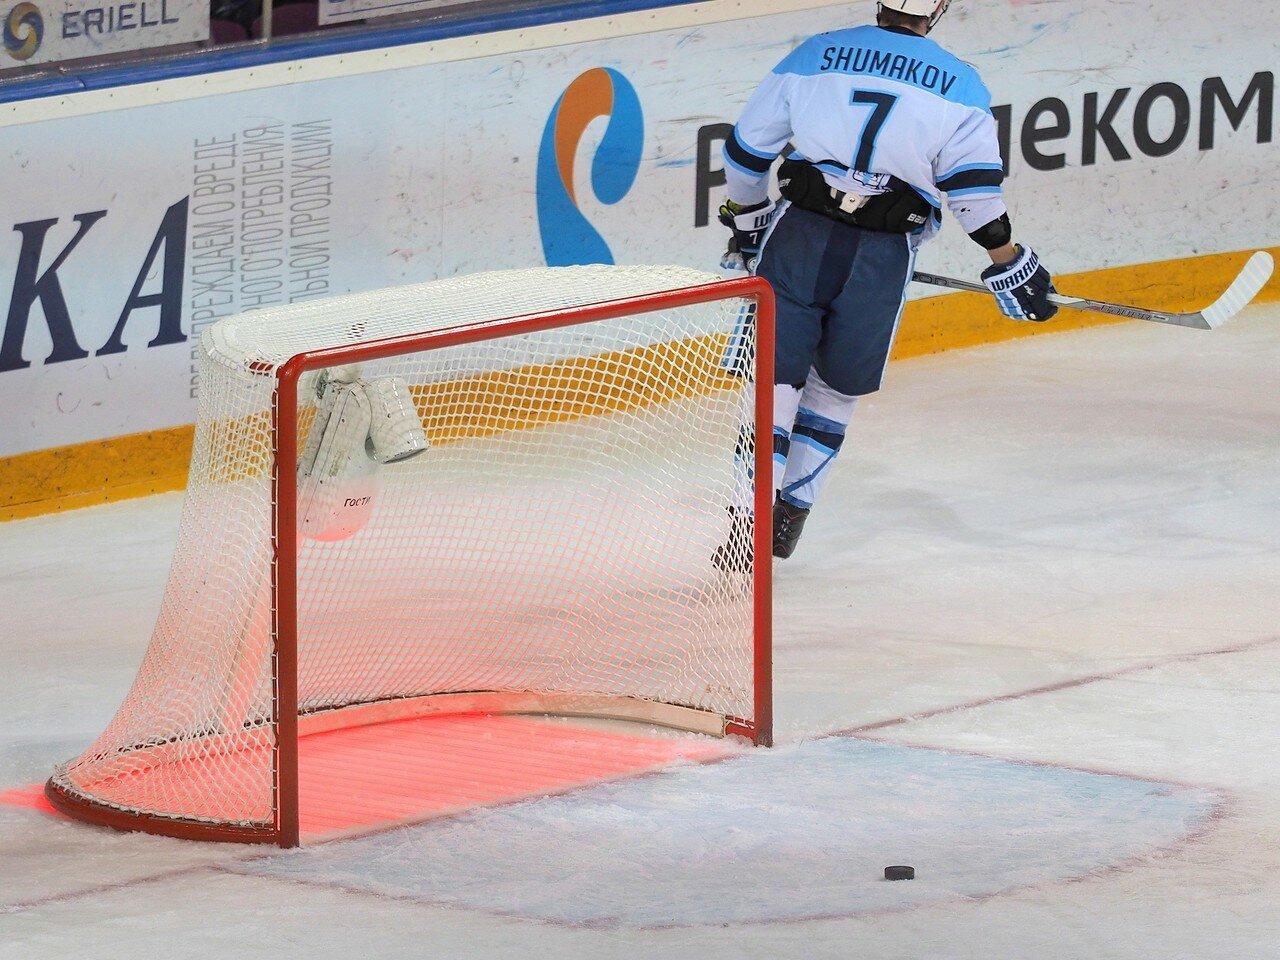 125Восток 1/2 плей-офф Металлург - Сибирь 08.03.2016